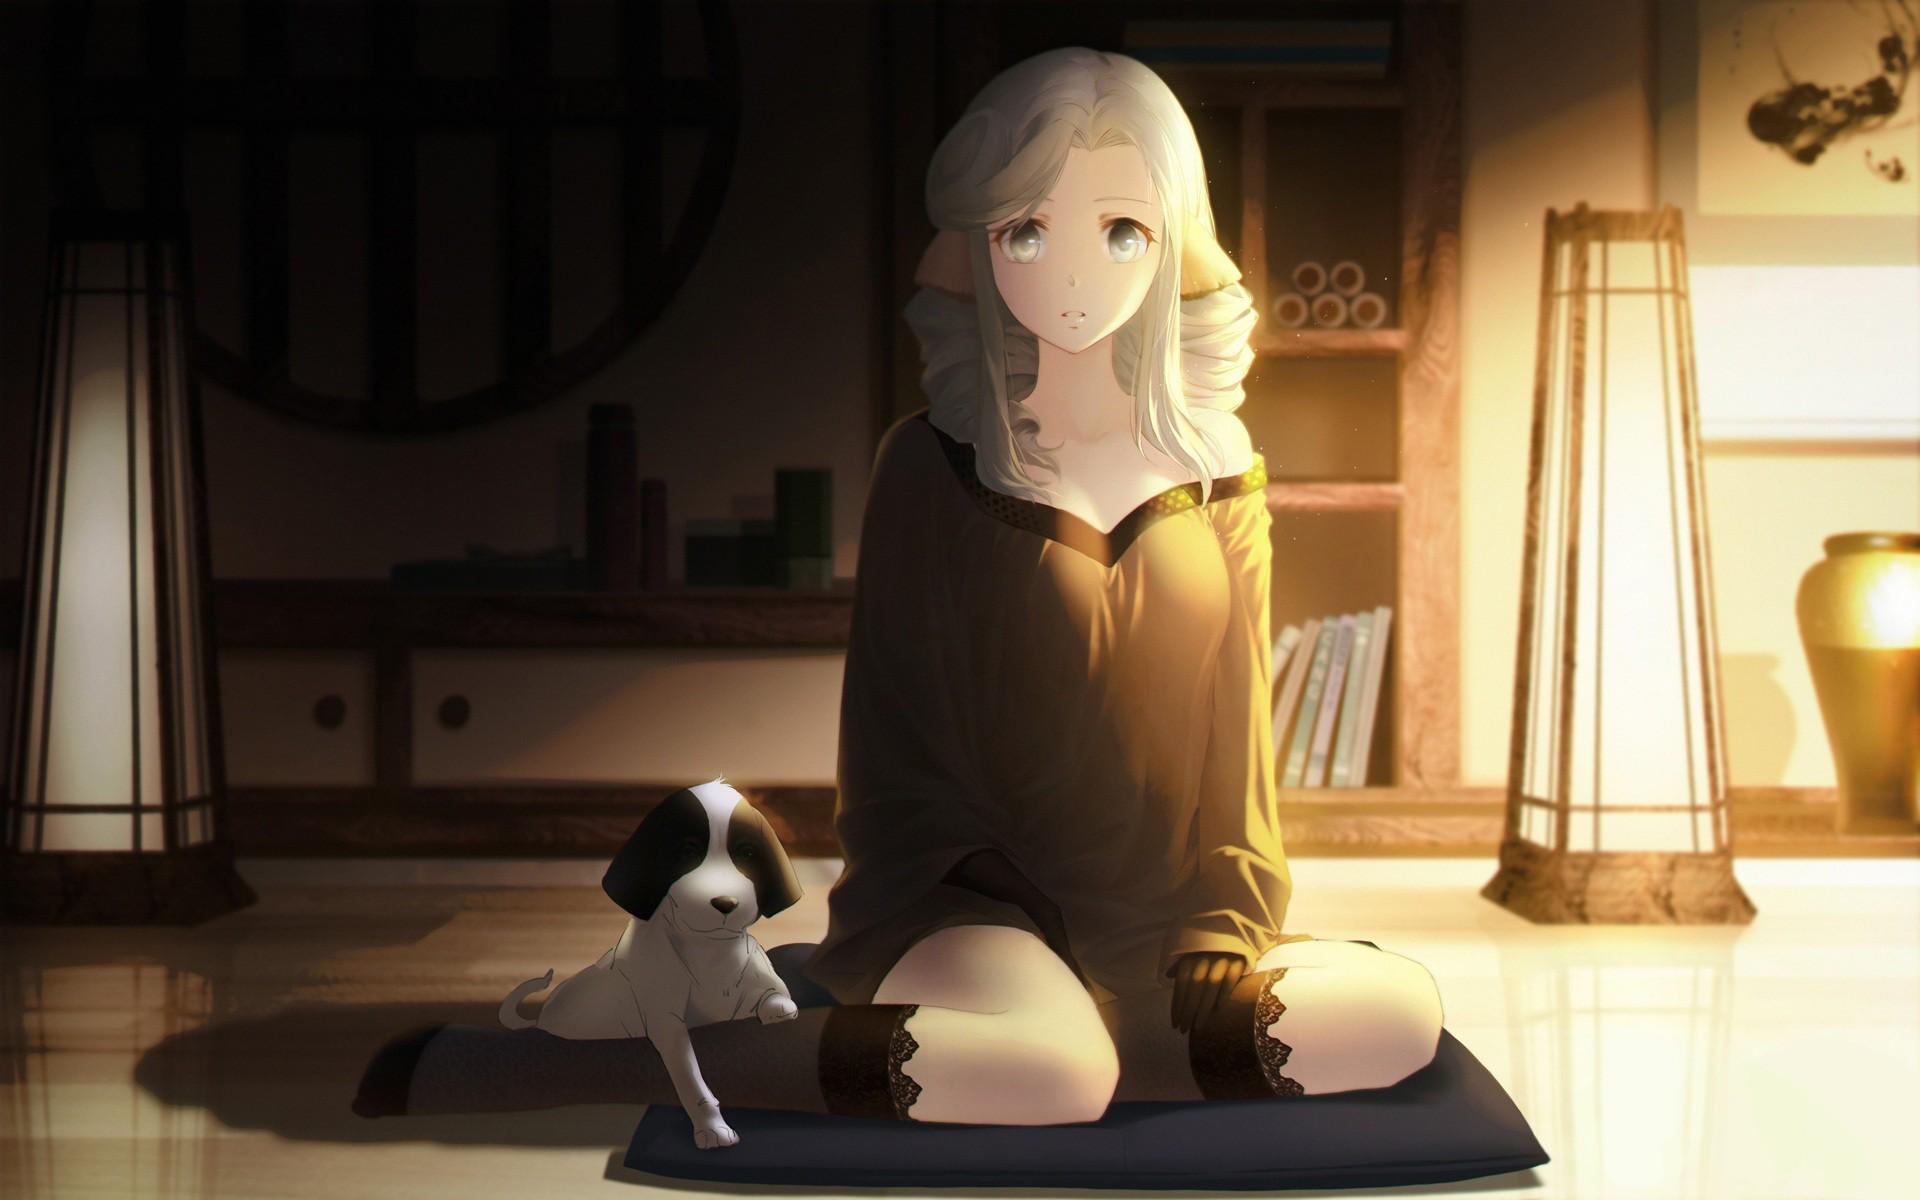 #gray Eyes, #cleavage, #utawarerumono, #anime, #dog, - Utawarerumono Itsuwari No Kamen Munechika , HD Wallpaper & Backgrounds